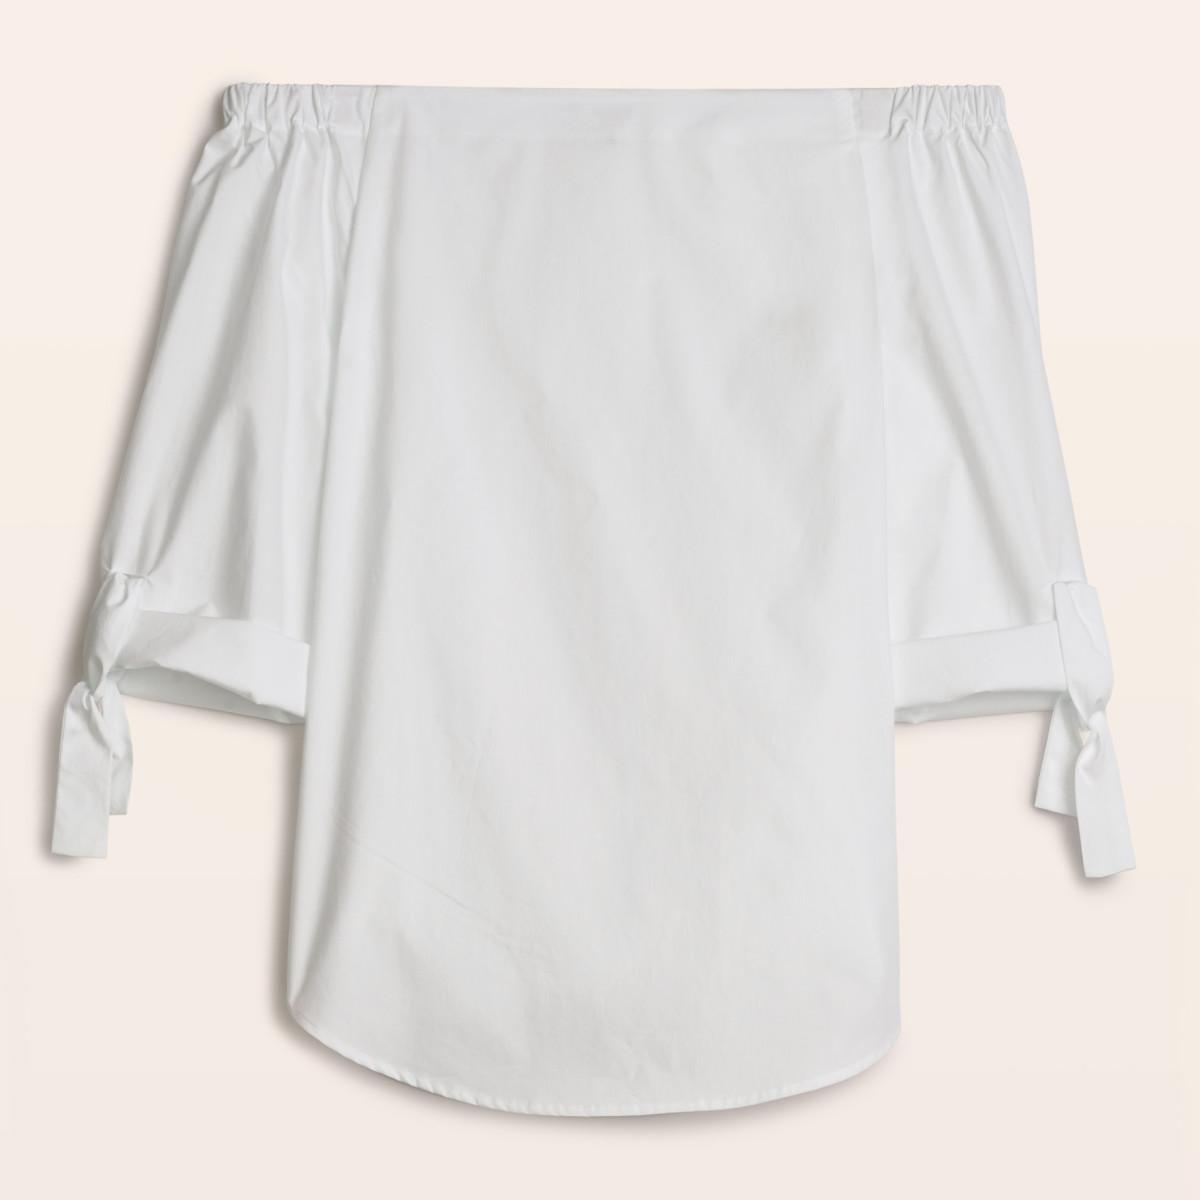 Babaton Malik blouse, $85, available at Aritzia.